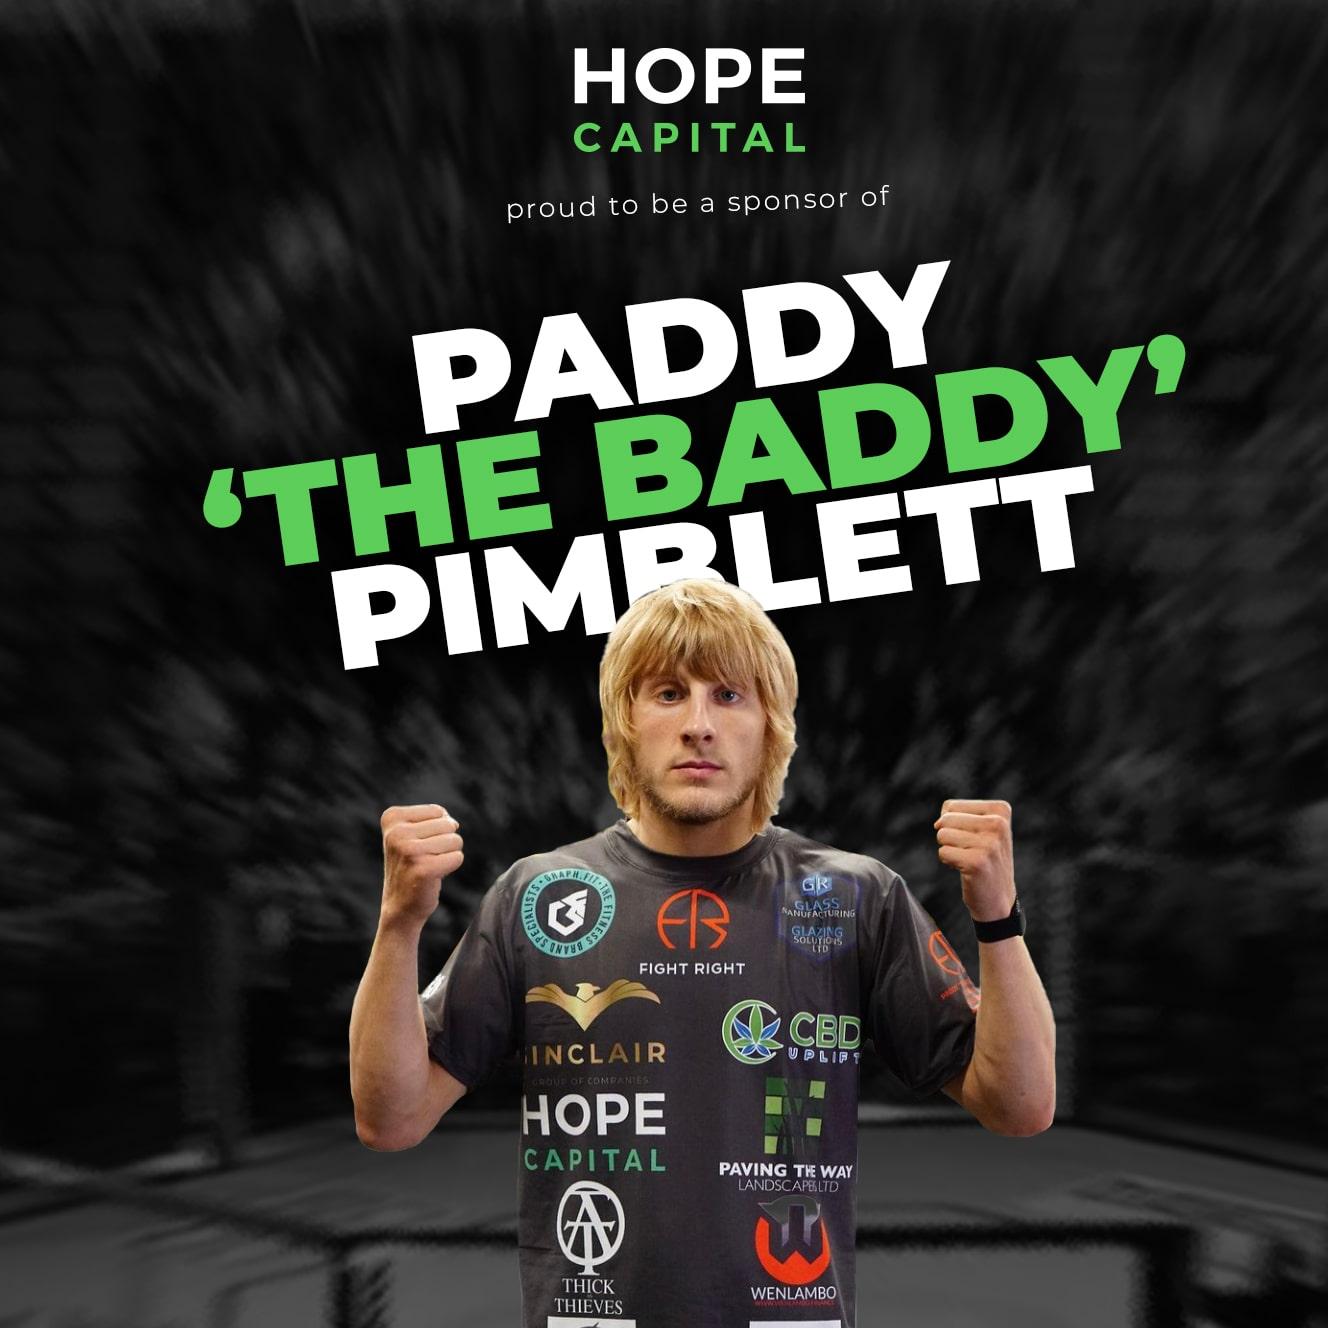 Paddy the Baddy